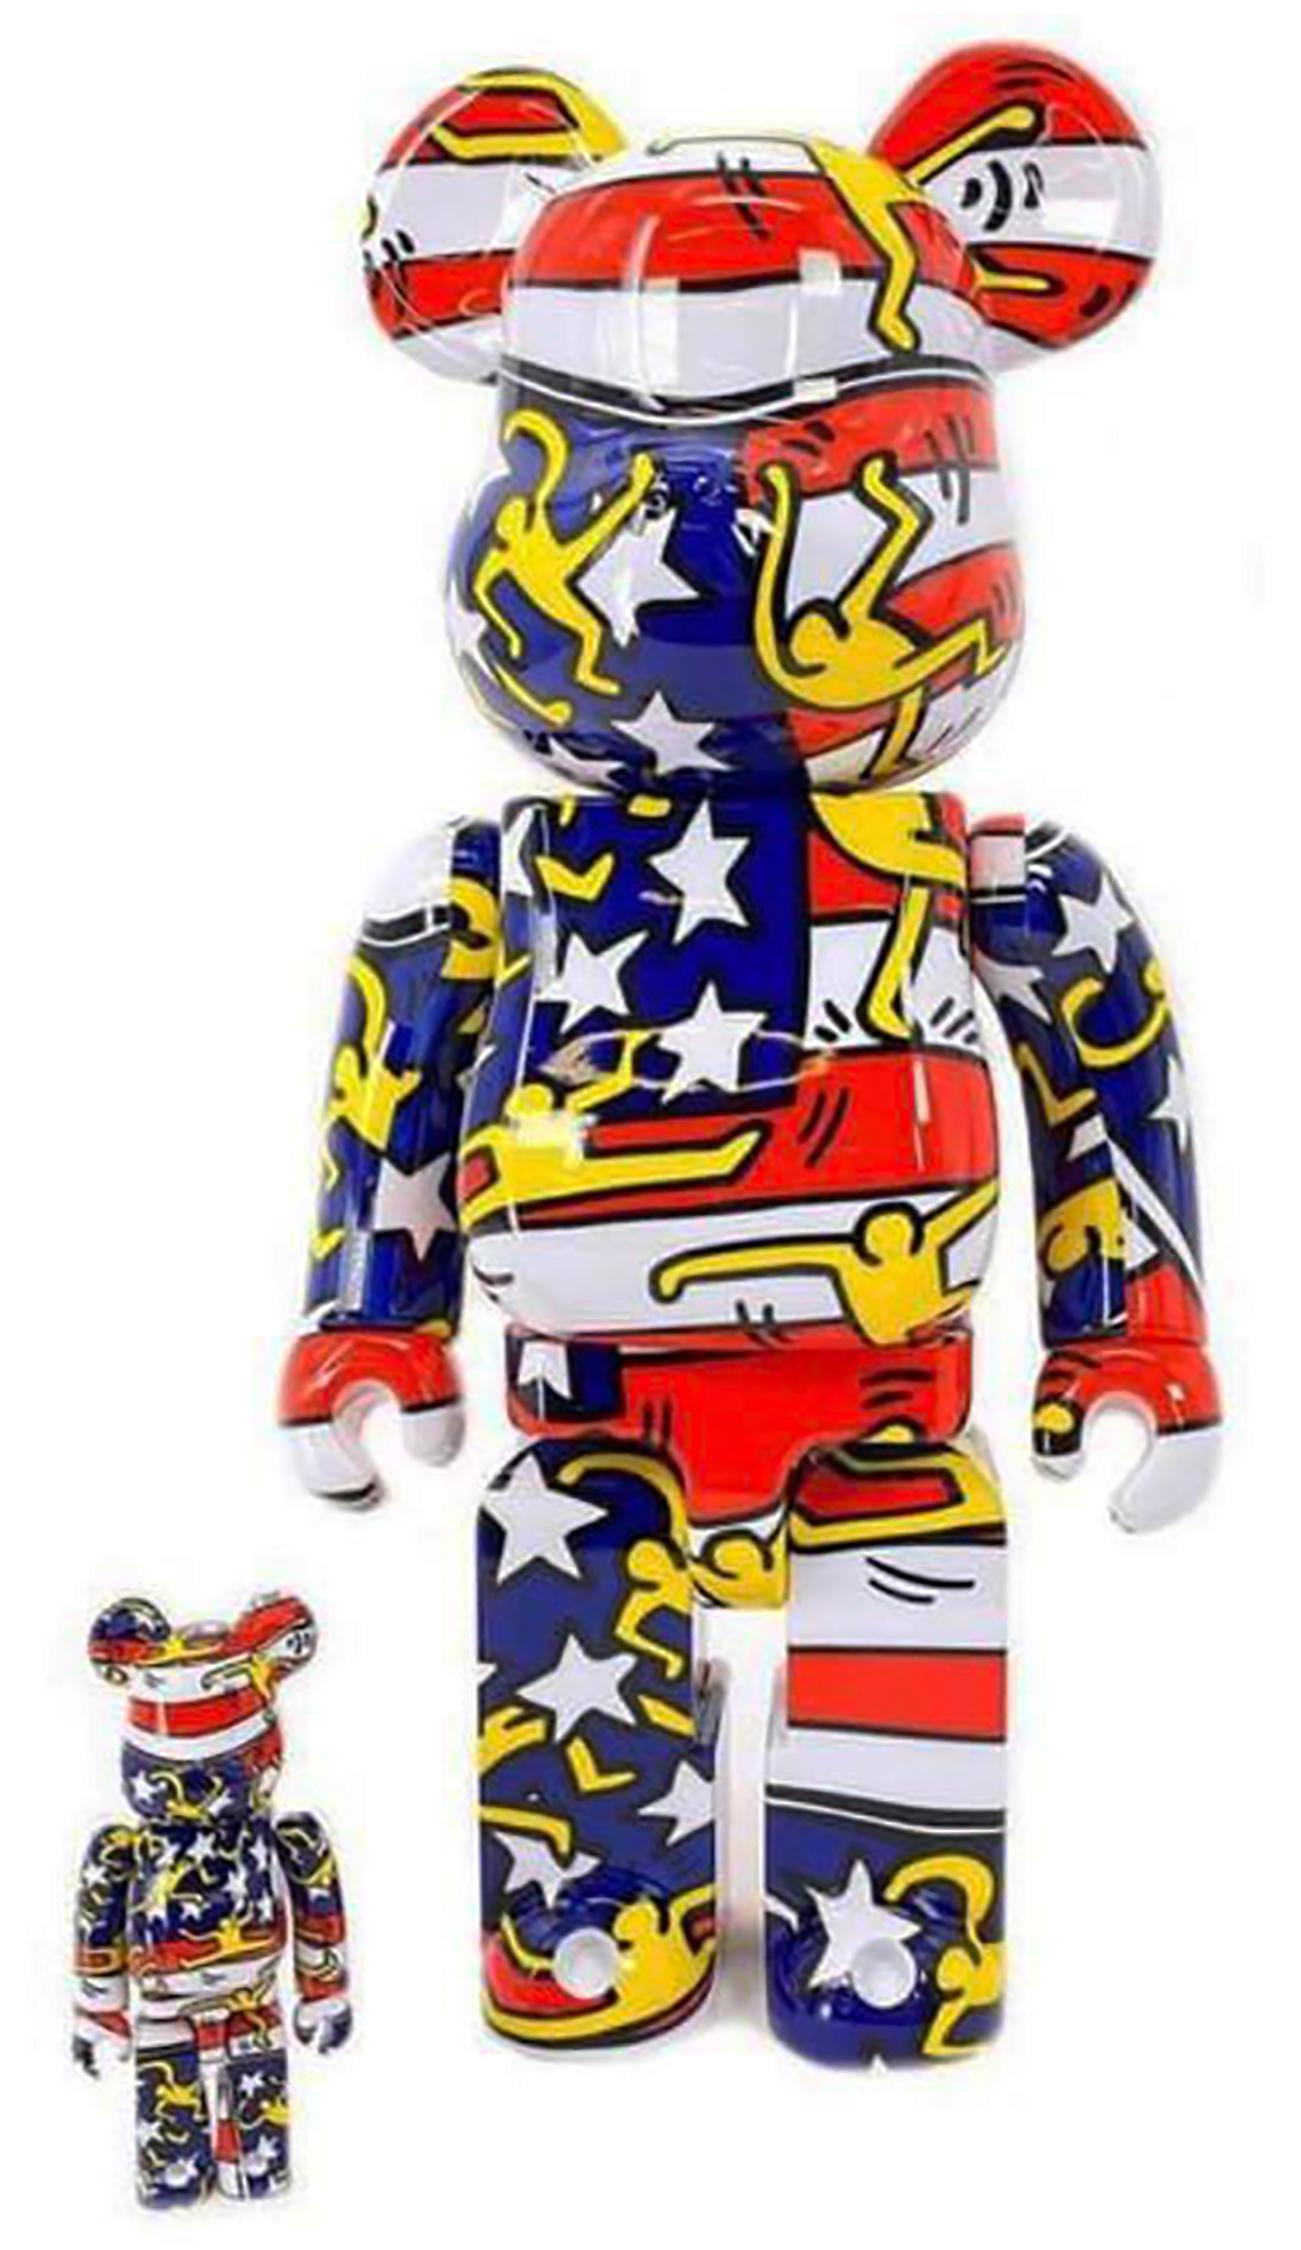 Keith Haring Bearbrick 400% Companion (Haring Designer Con BE@RBRICK)